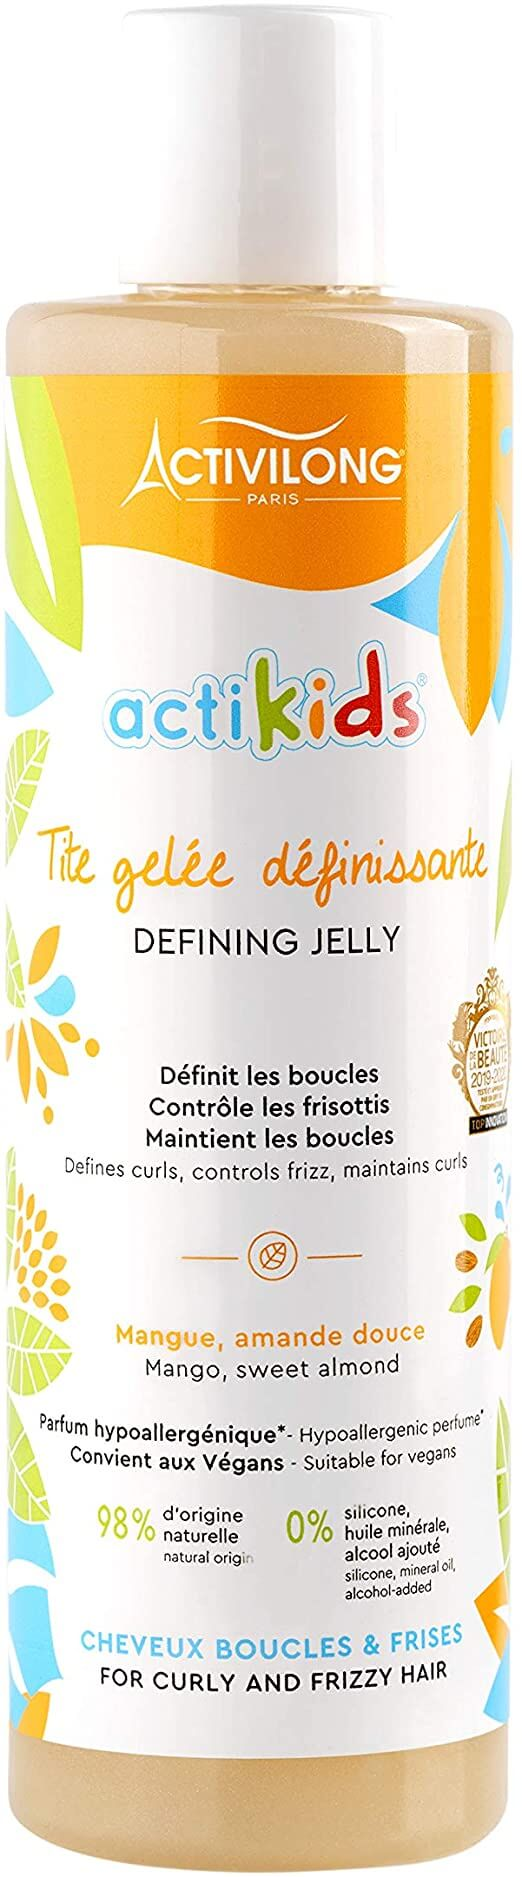 ACTI KIDS DEFINING JELLY